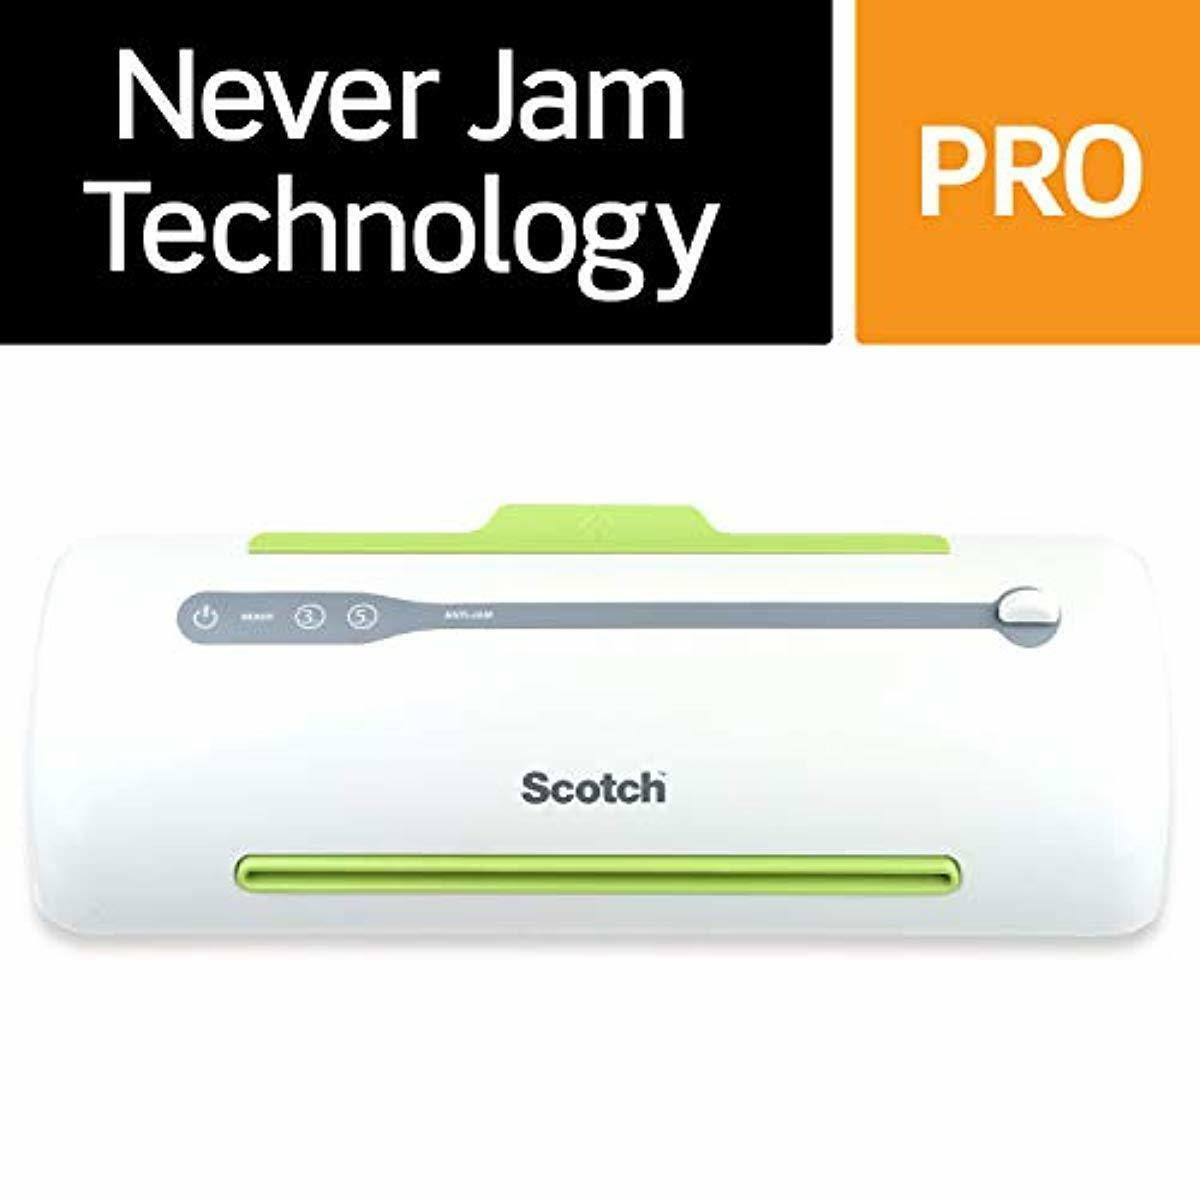 Scotch Pro Thermal Laminator, Never Jam Technology Automatic